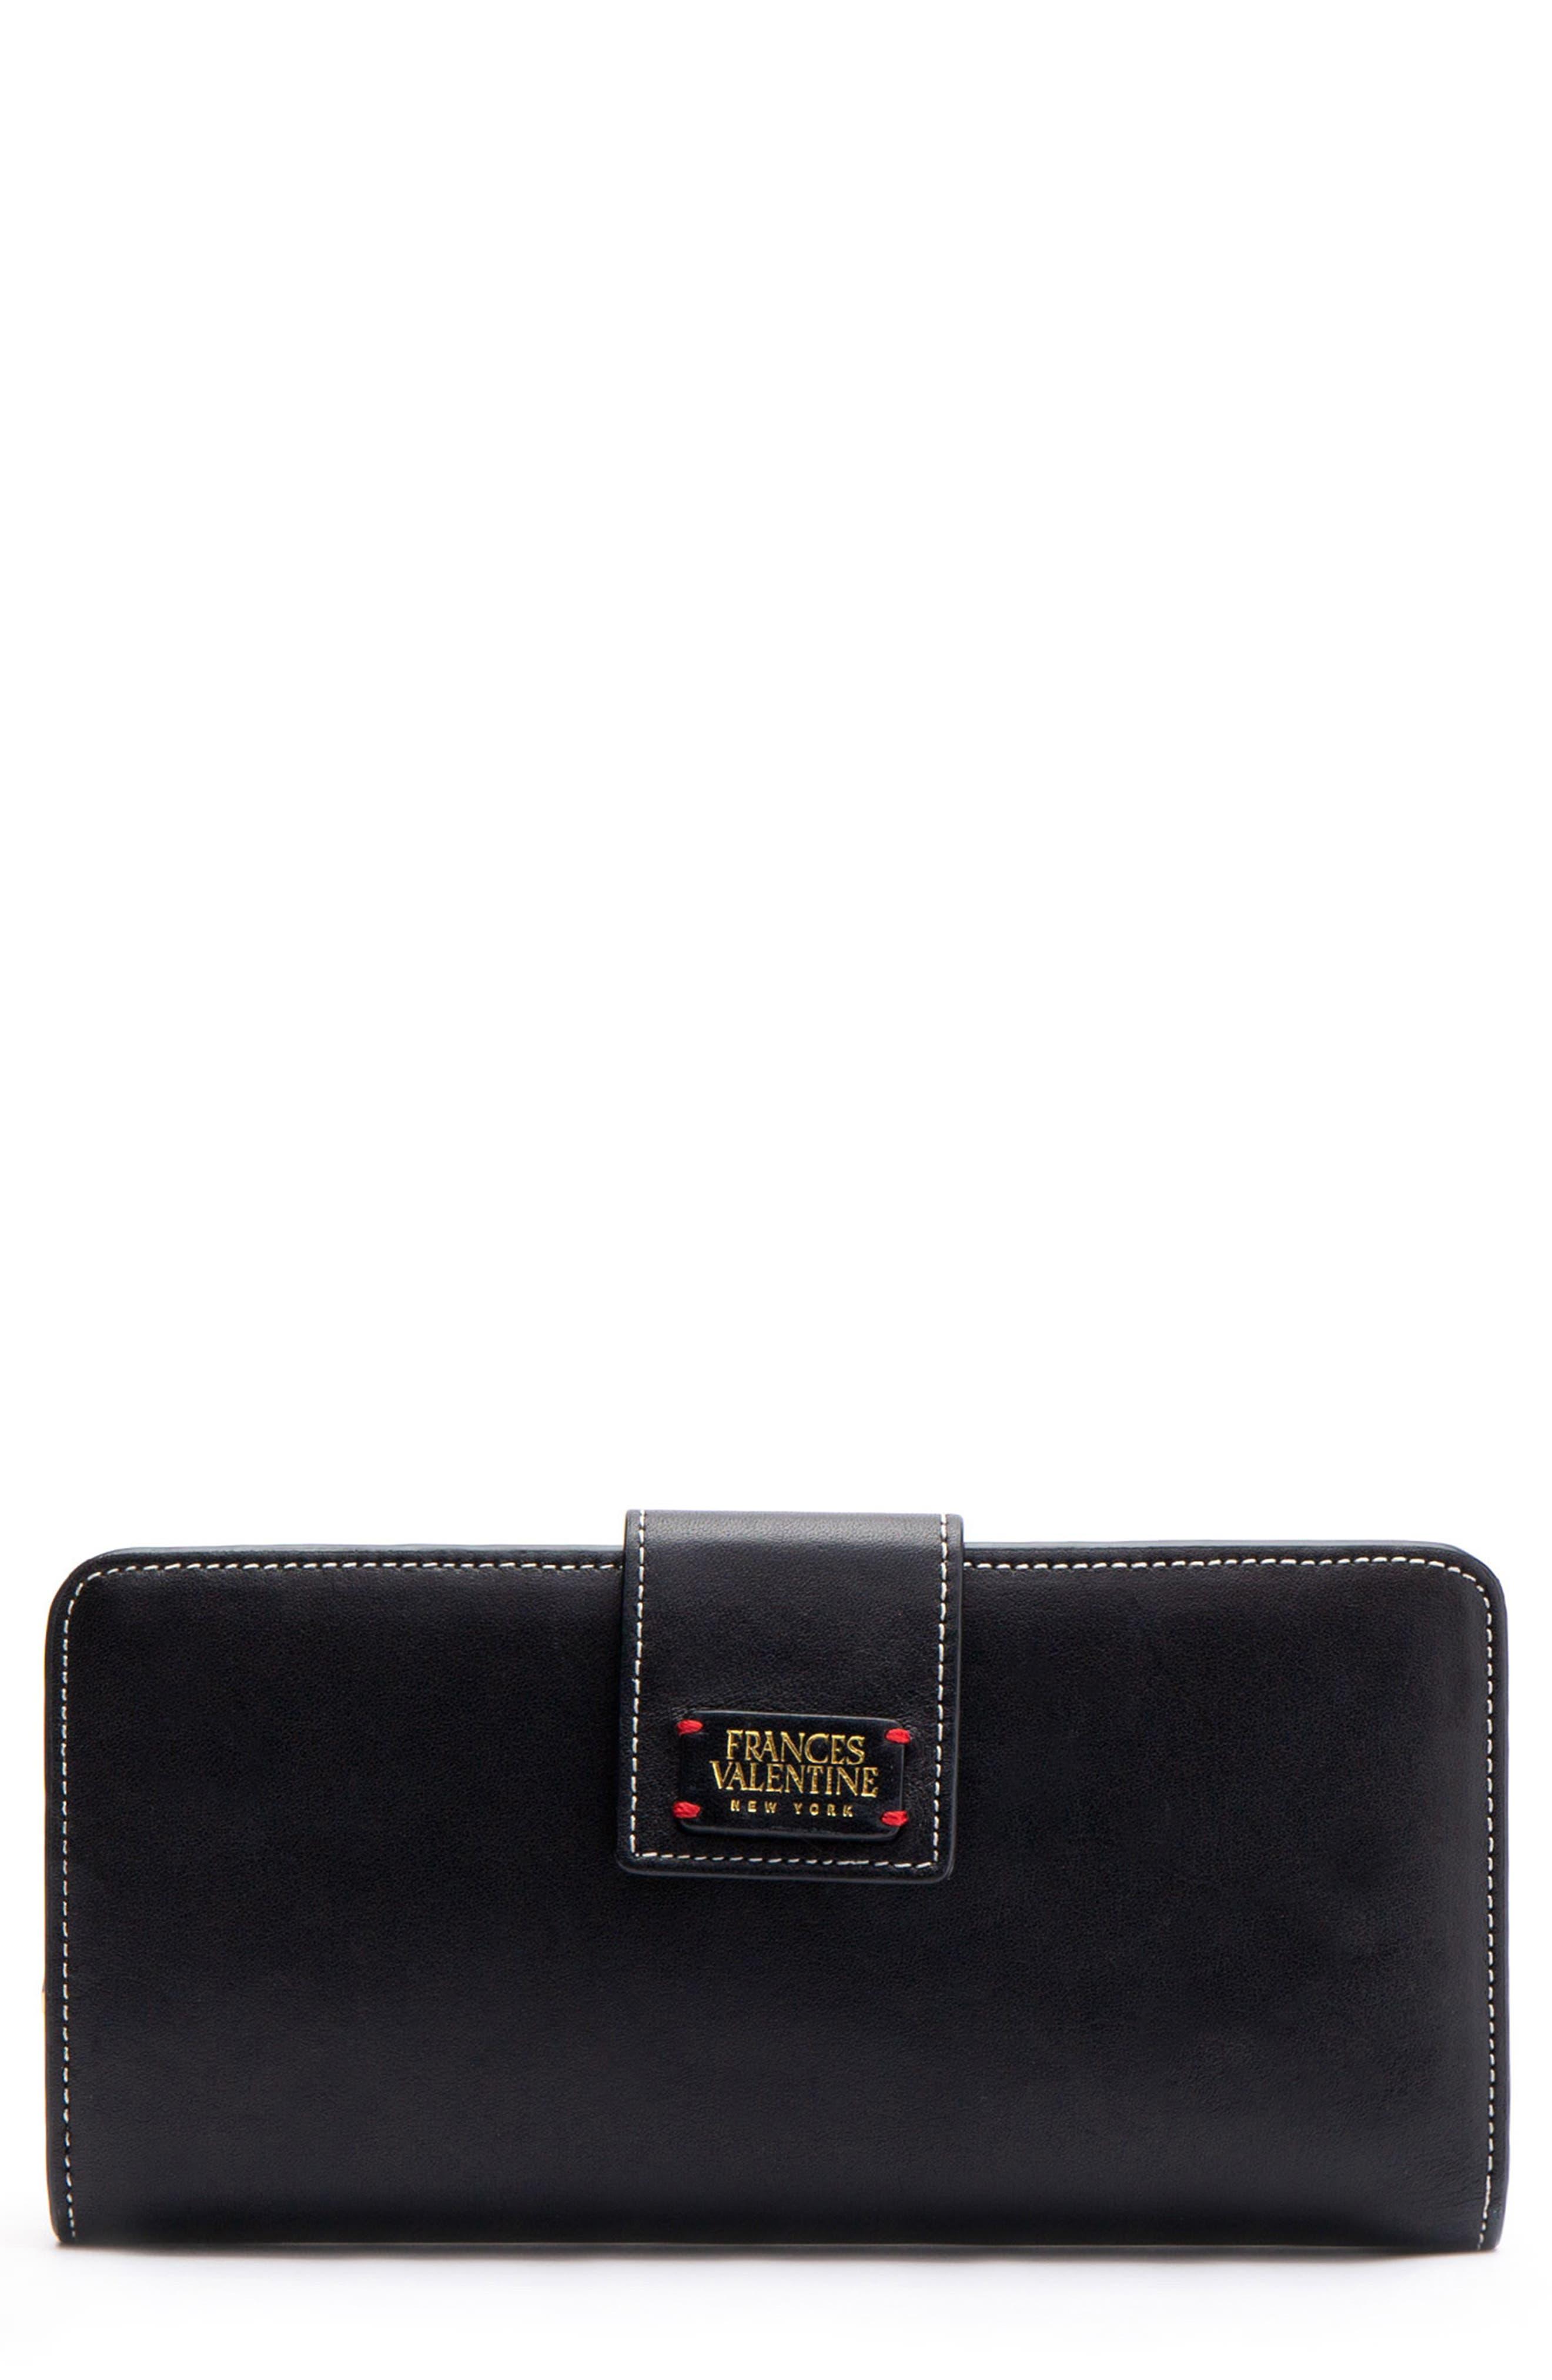 Jefferson Slim Calfskin Leather Wallet,                         Main,                         color, BLACK/ OYSTER